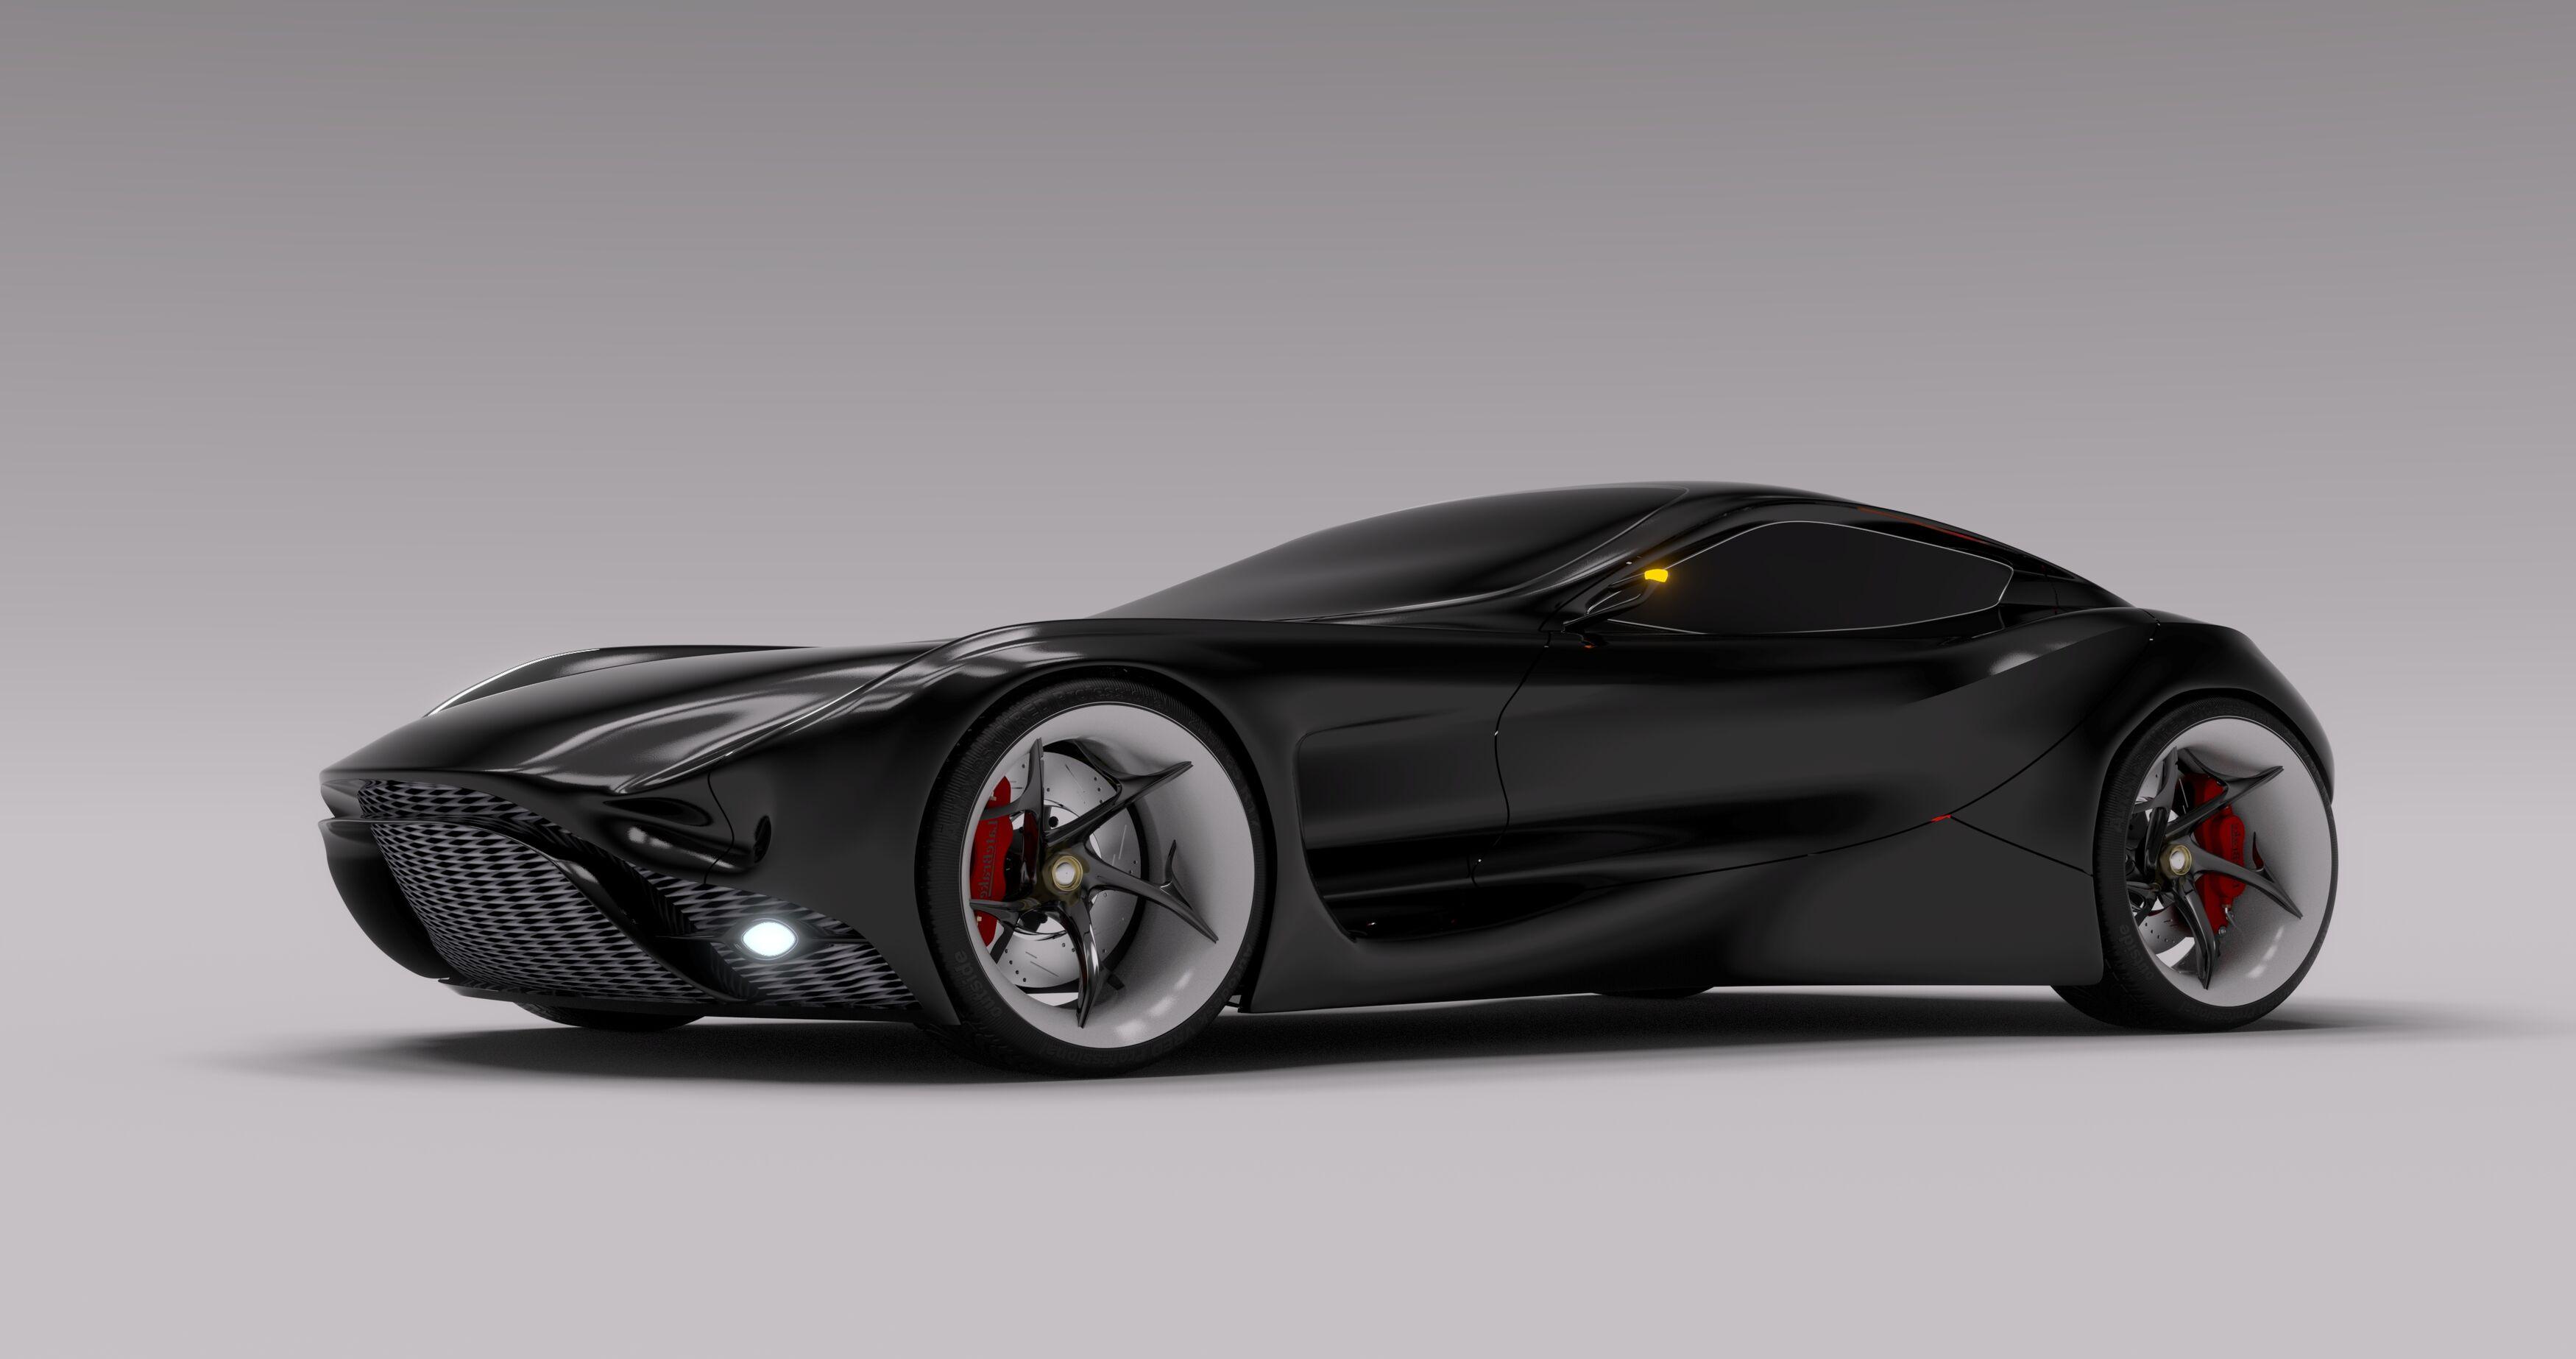 Aston-martin-db-zagato-x-2-3500-3500